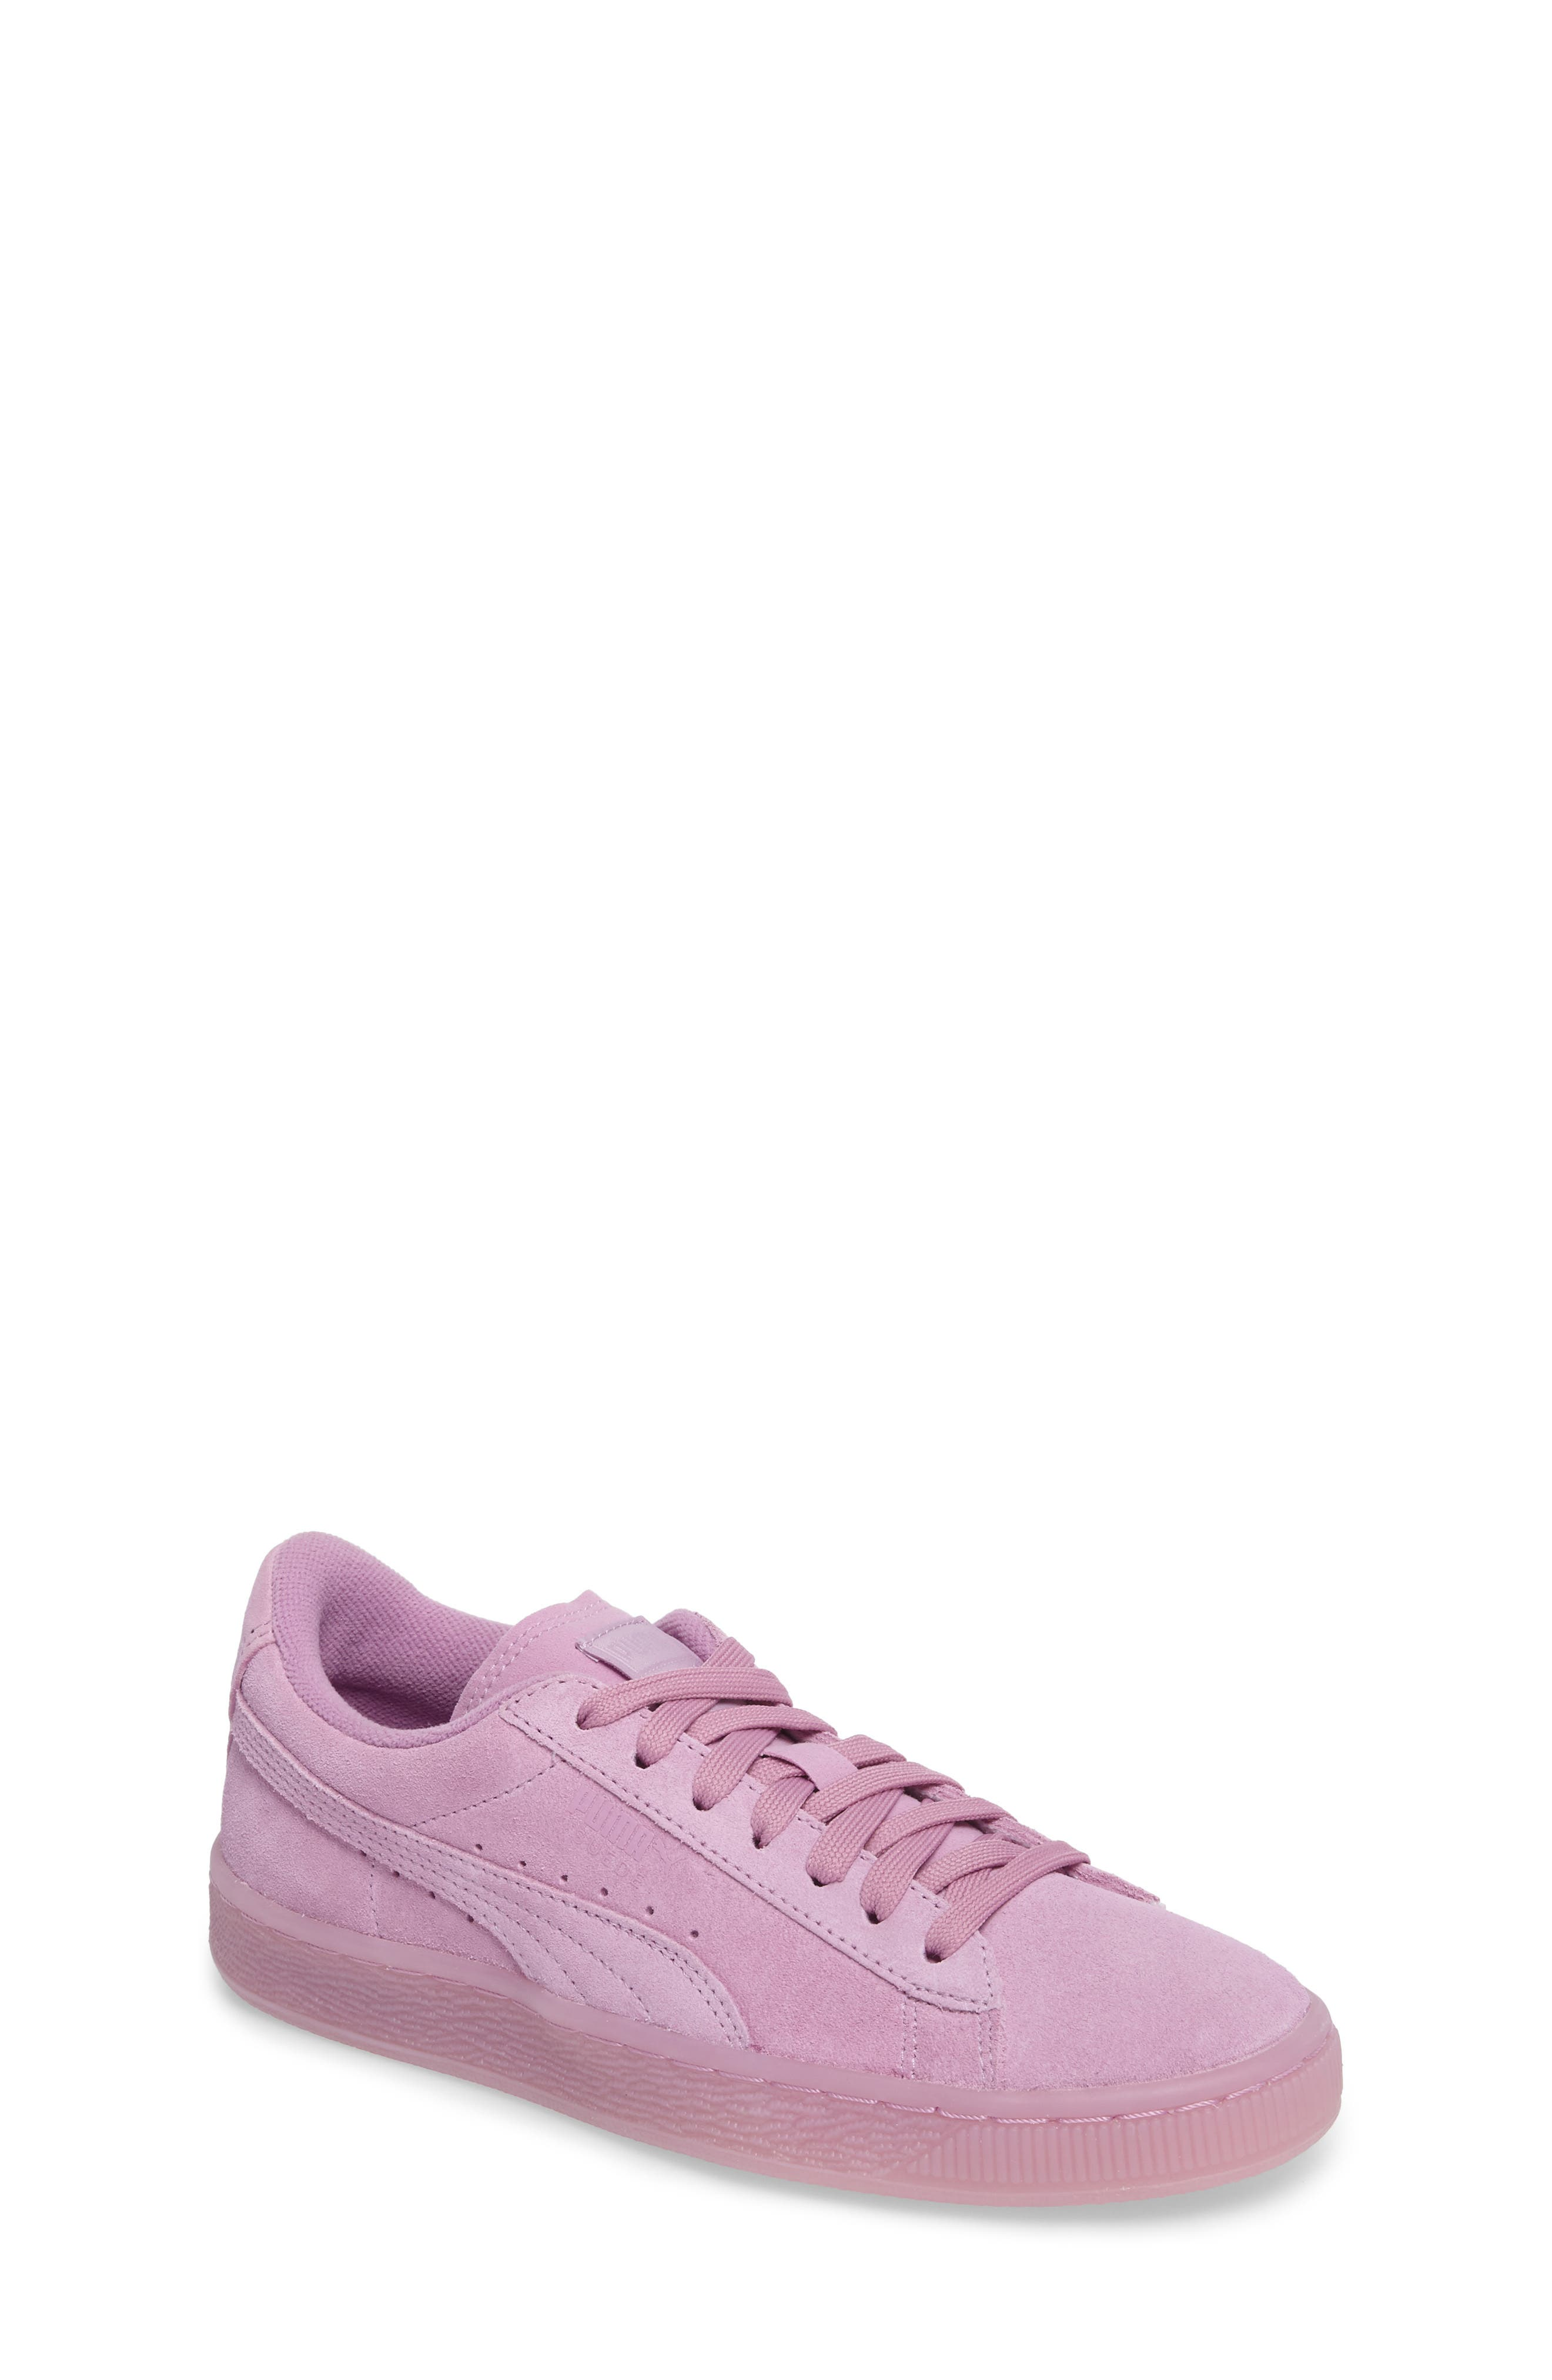 PUMA Iced Suede Sneaker (Big Kid)